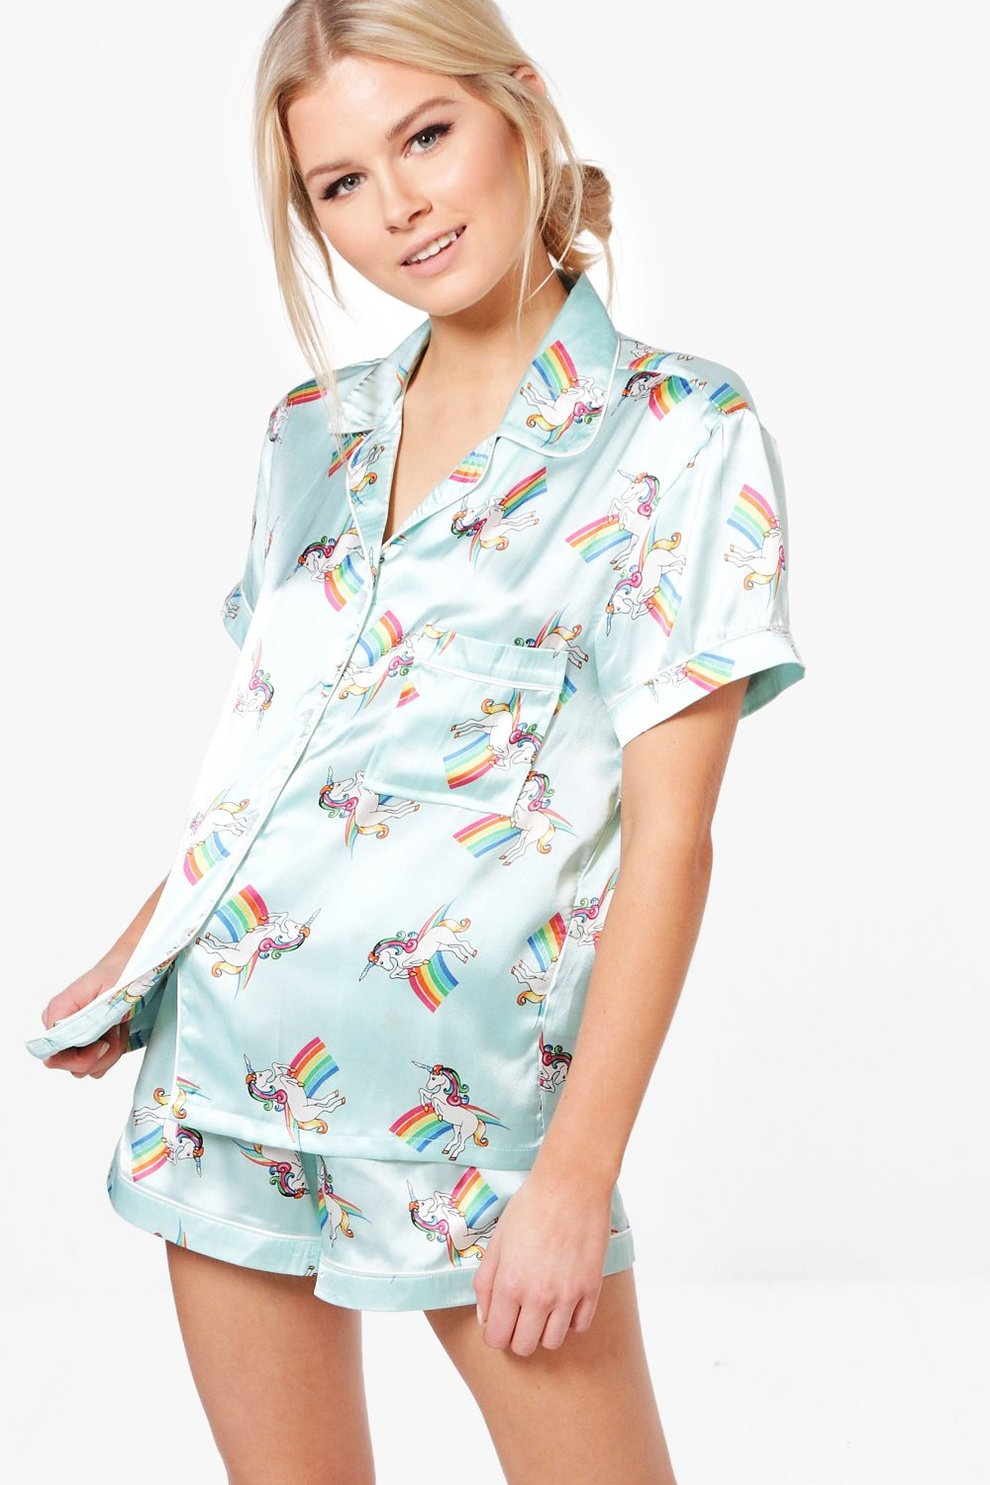 alice parure de pyjama short et chemise imprimé licorne  3dbf3aa5f71